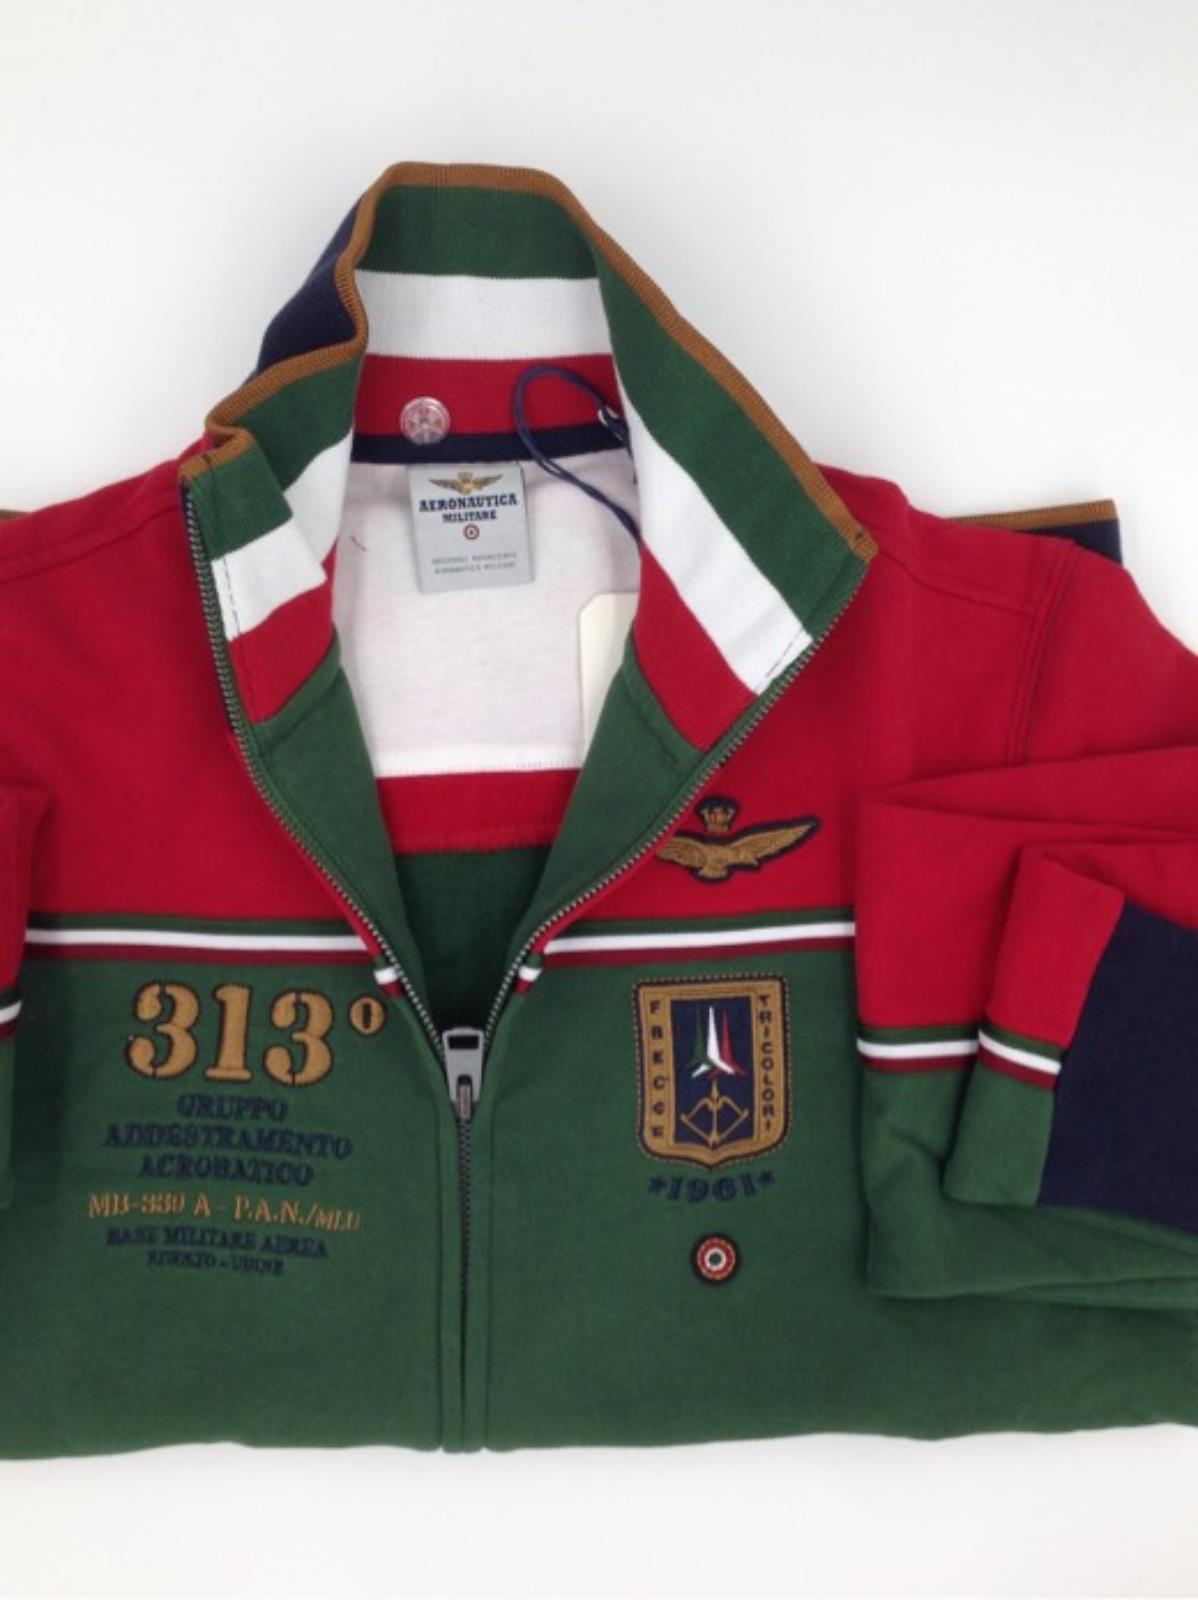 Aeronautica Shop Online Militare Giannini fe1133f303 Felpa xFWF4frIwq